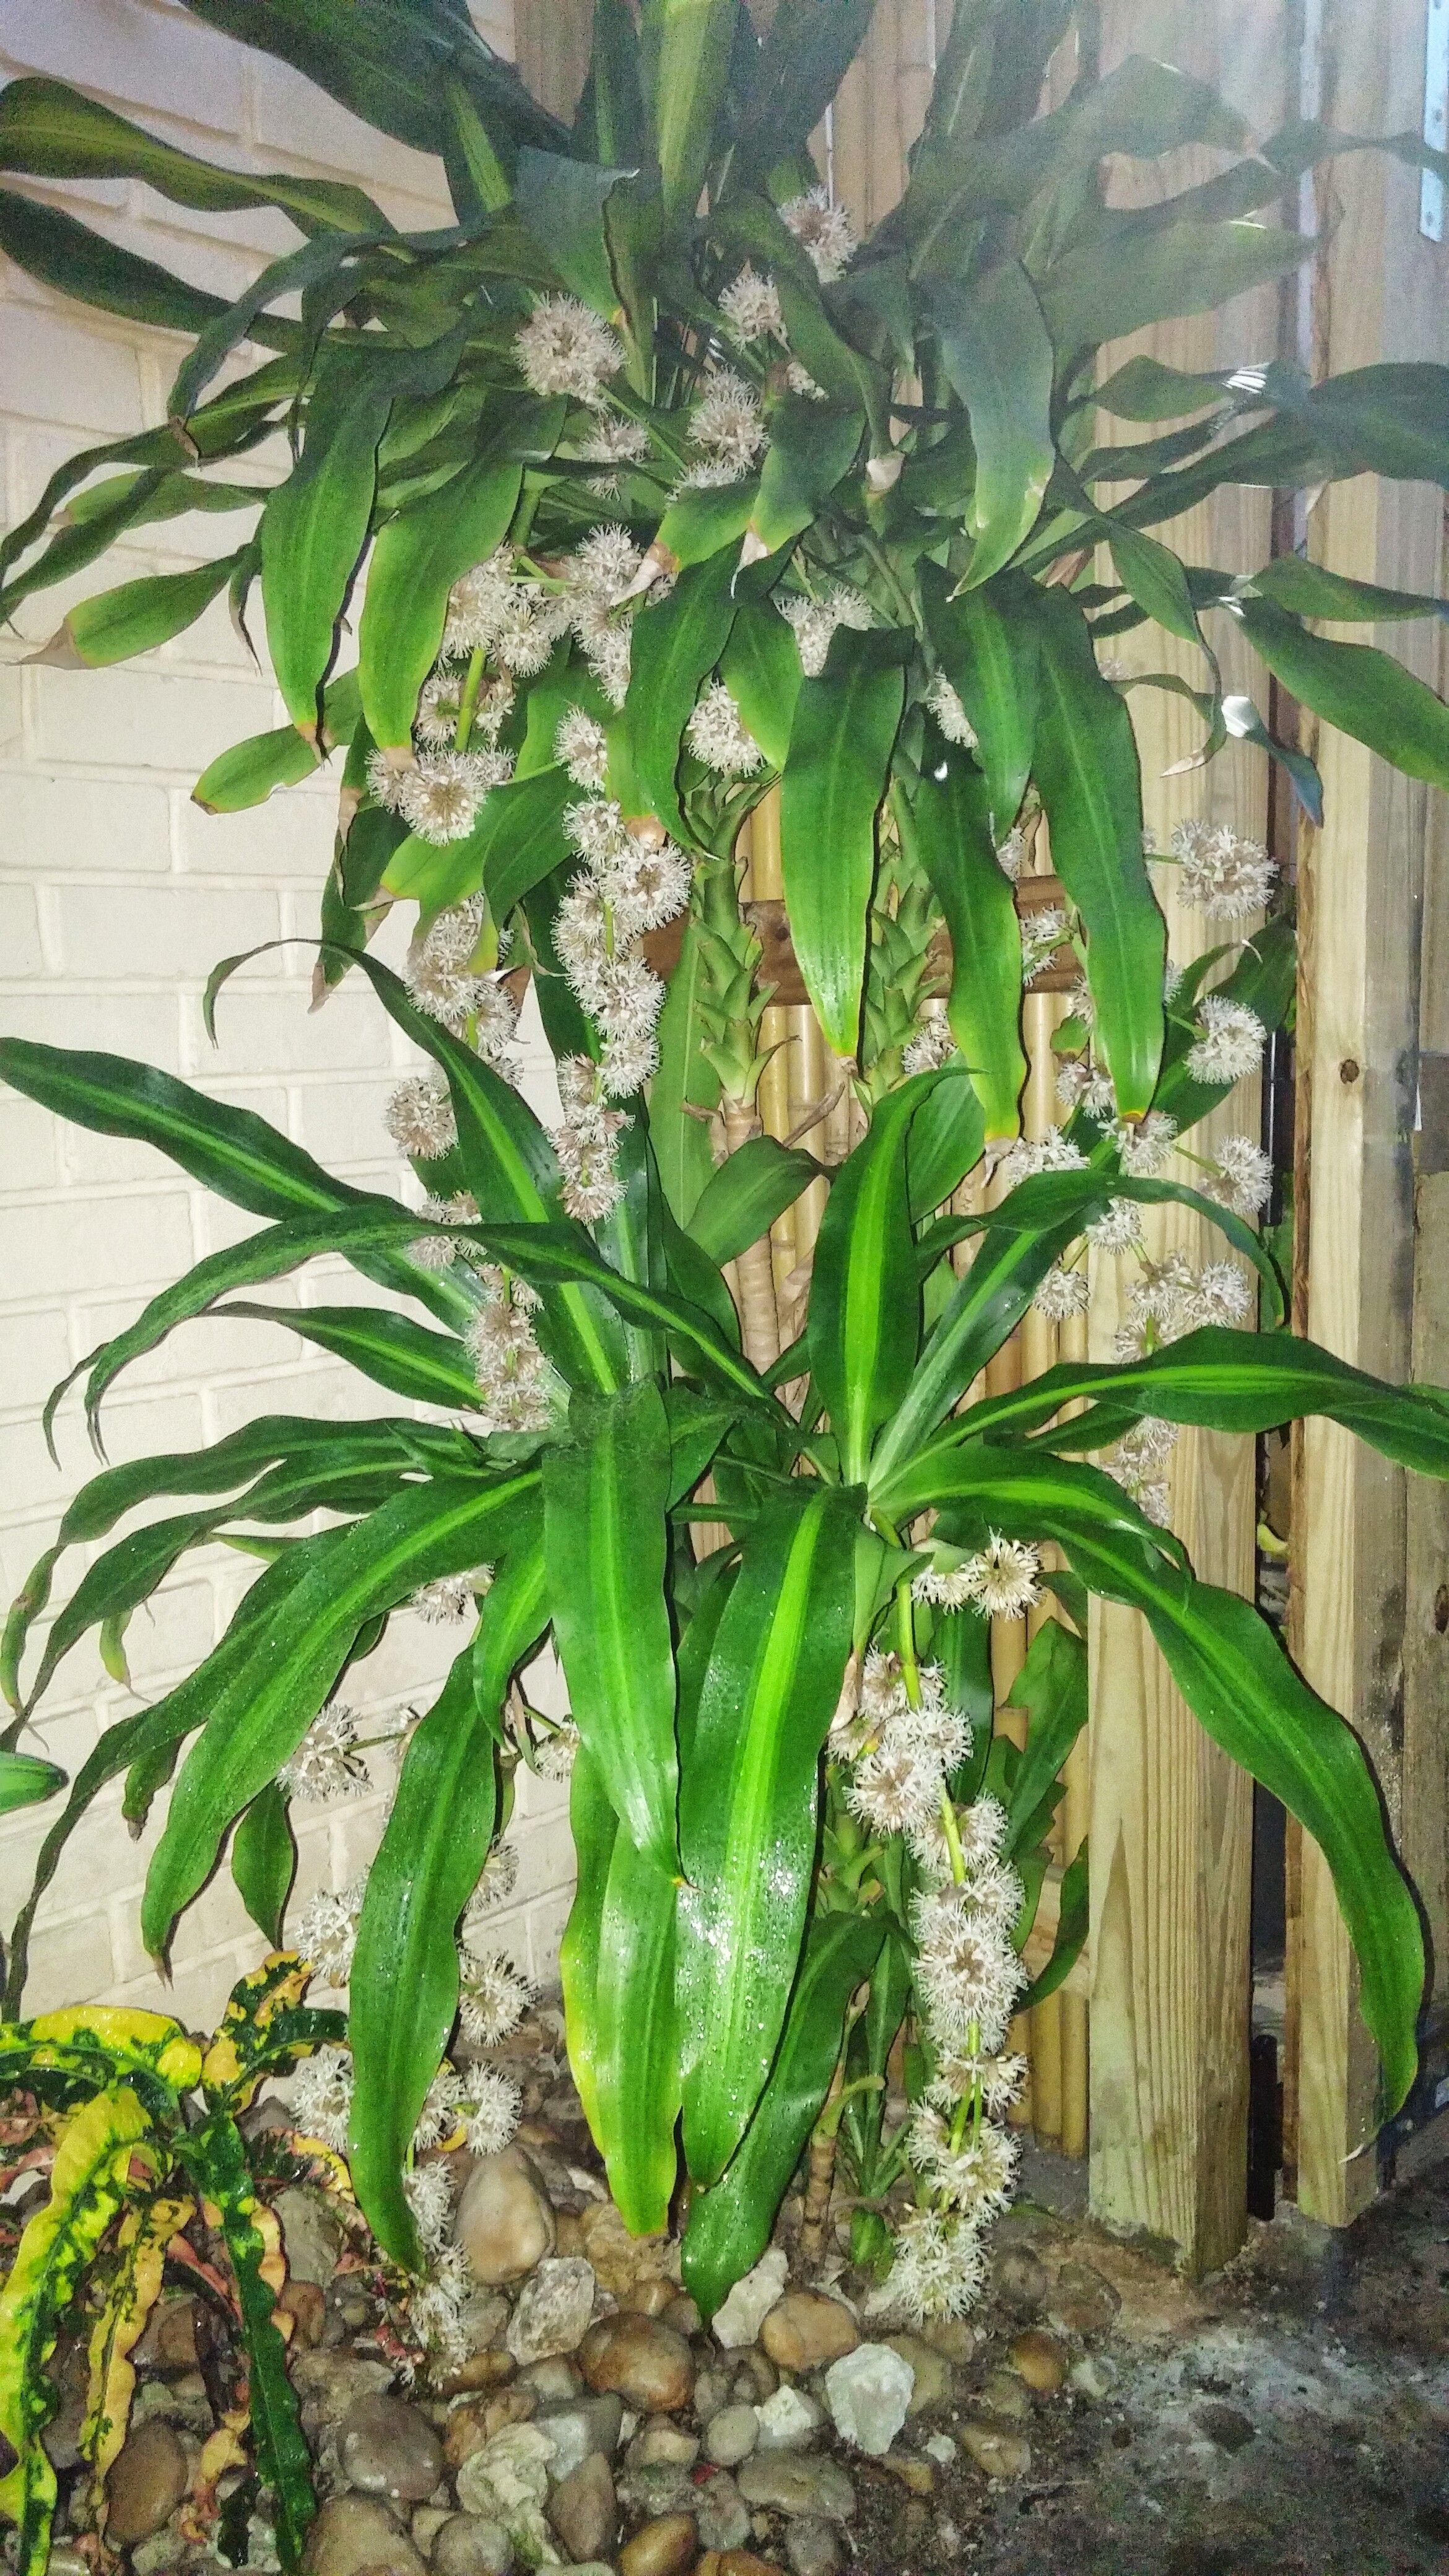 corn plant dracaena fragrans in bloom dec 31 2015. Black Bedroom Furniture Sets. Home Design Ideas